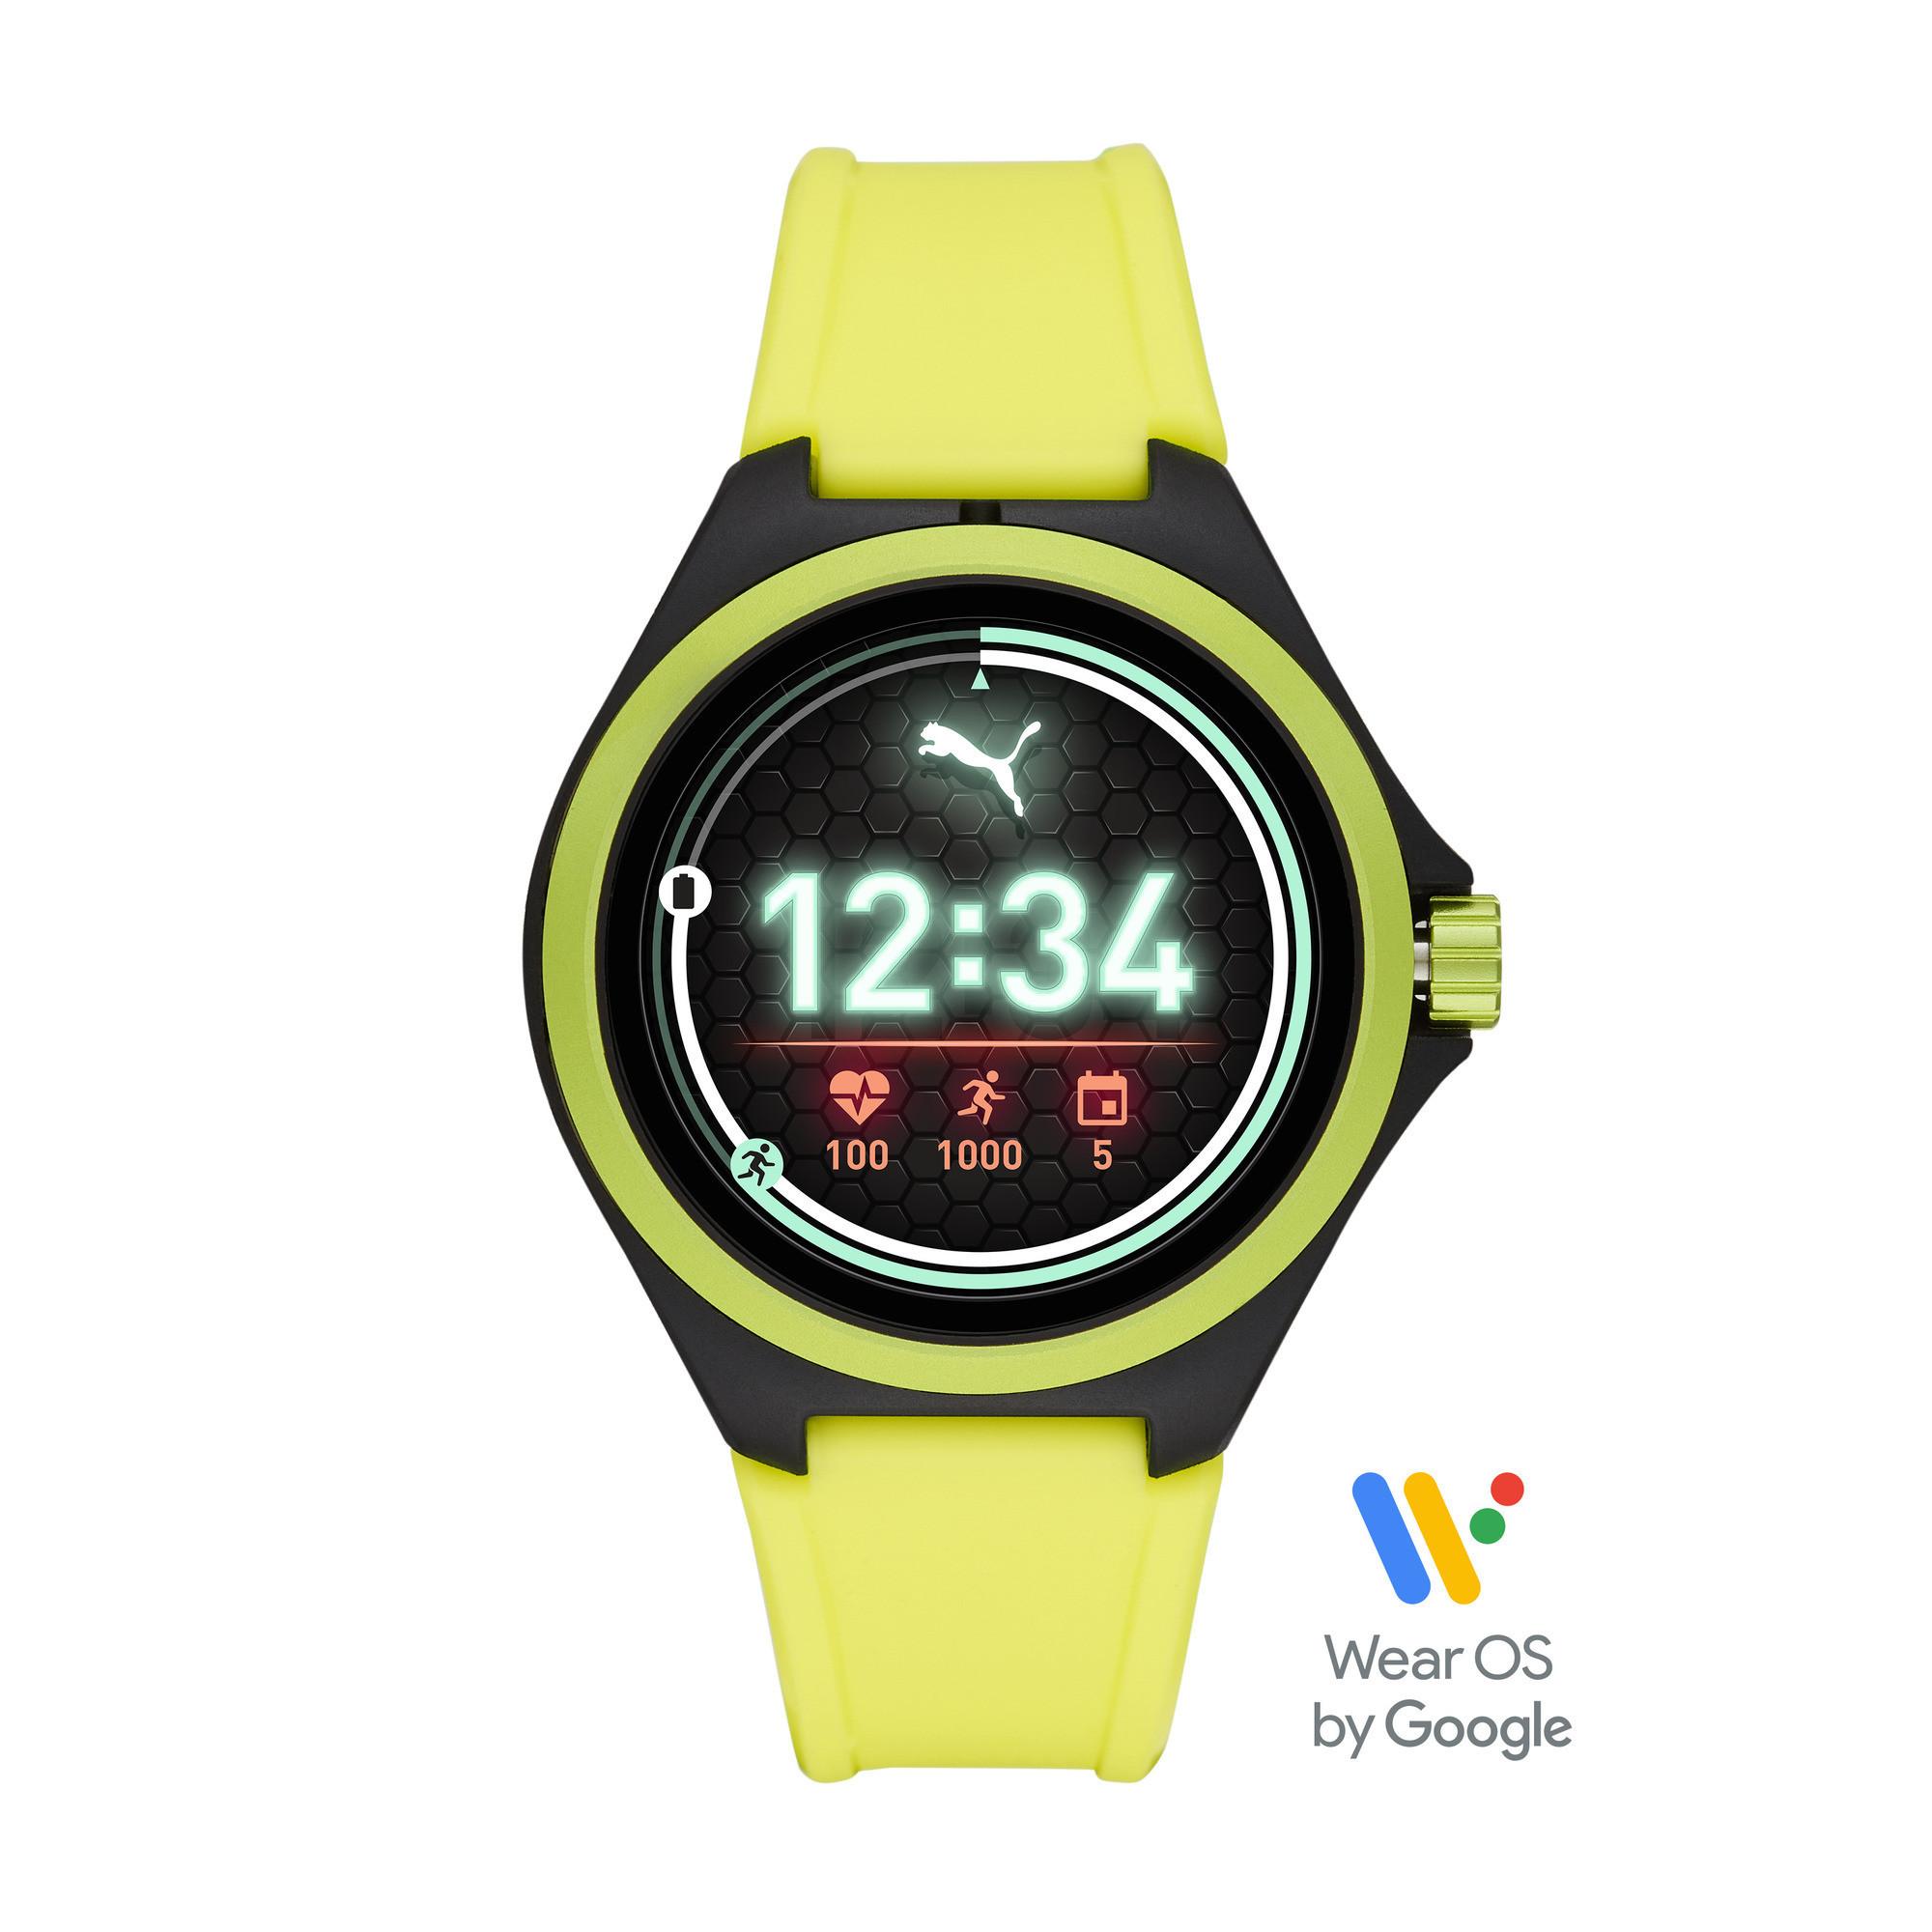 Credit:  image from https://ca.puma.com/en/ca/smartwatch?mktID=Internal:GlobalRedirect:smartwatchLaunch:BU:Canada